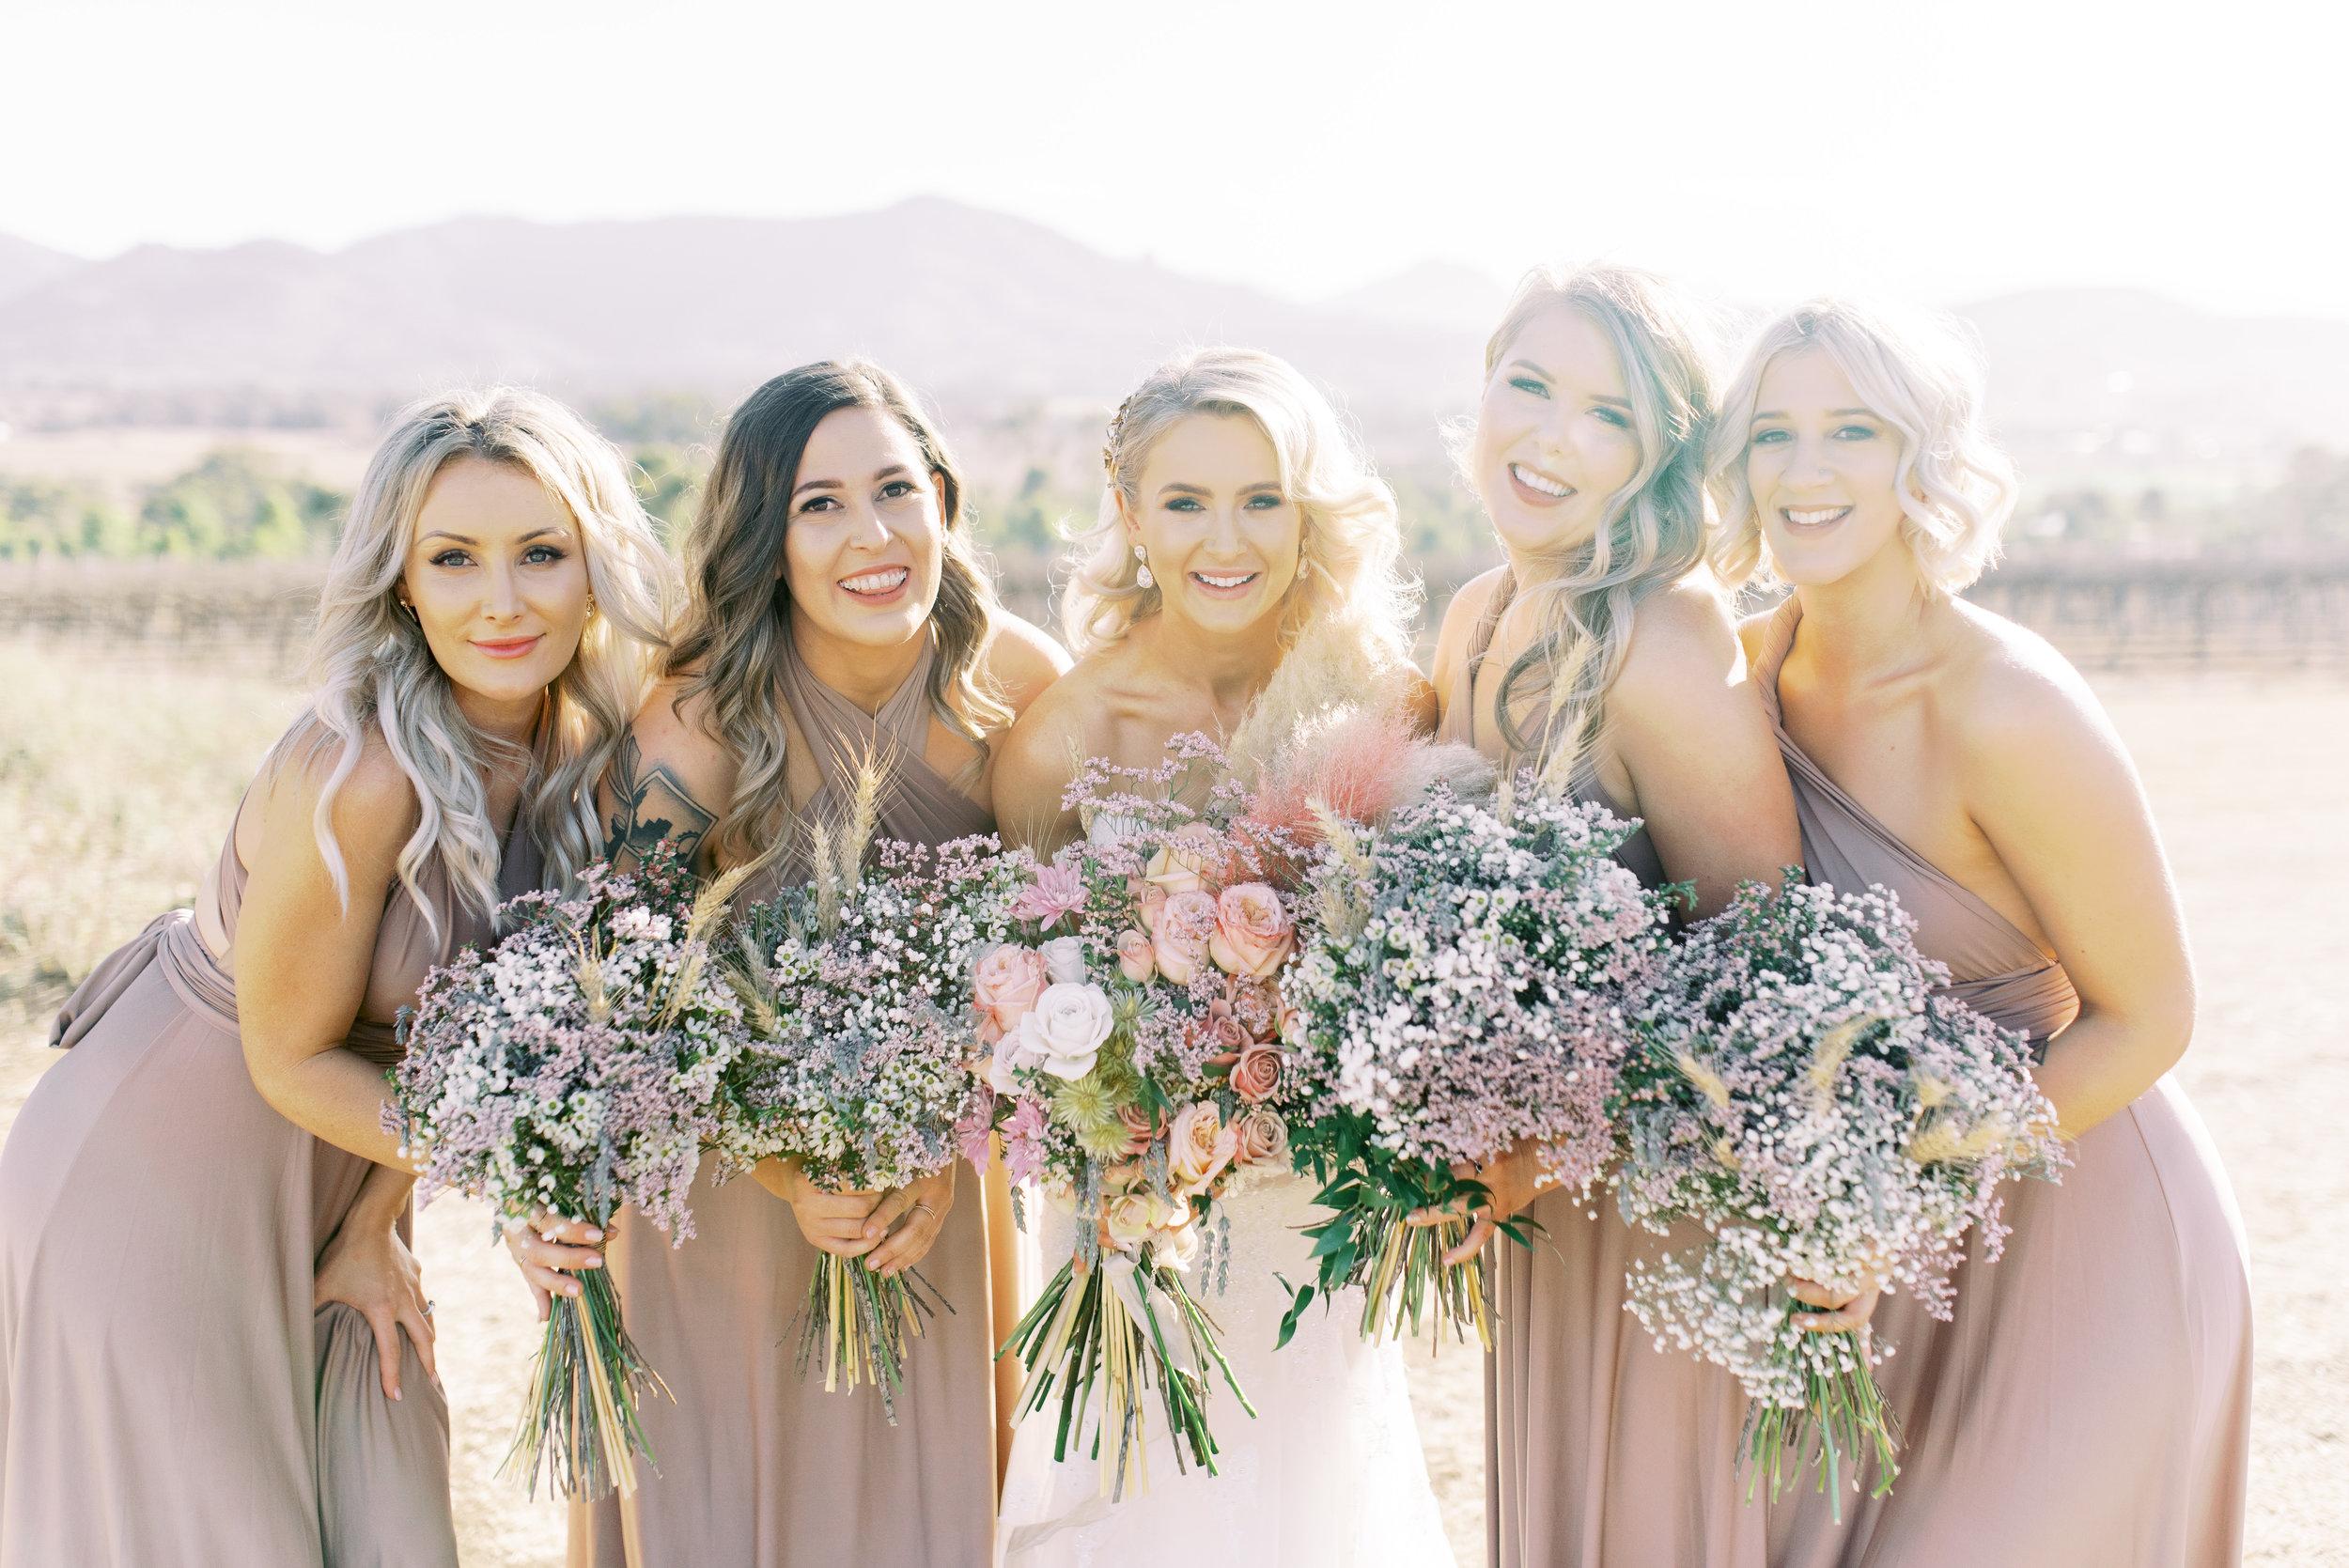 Kooroomba-Vineyard-Lavender-Farm-Wedding-Fine-Art-Lauren-Olivia-55.jpg